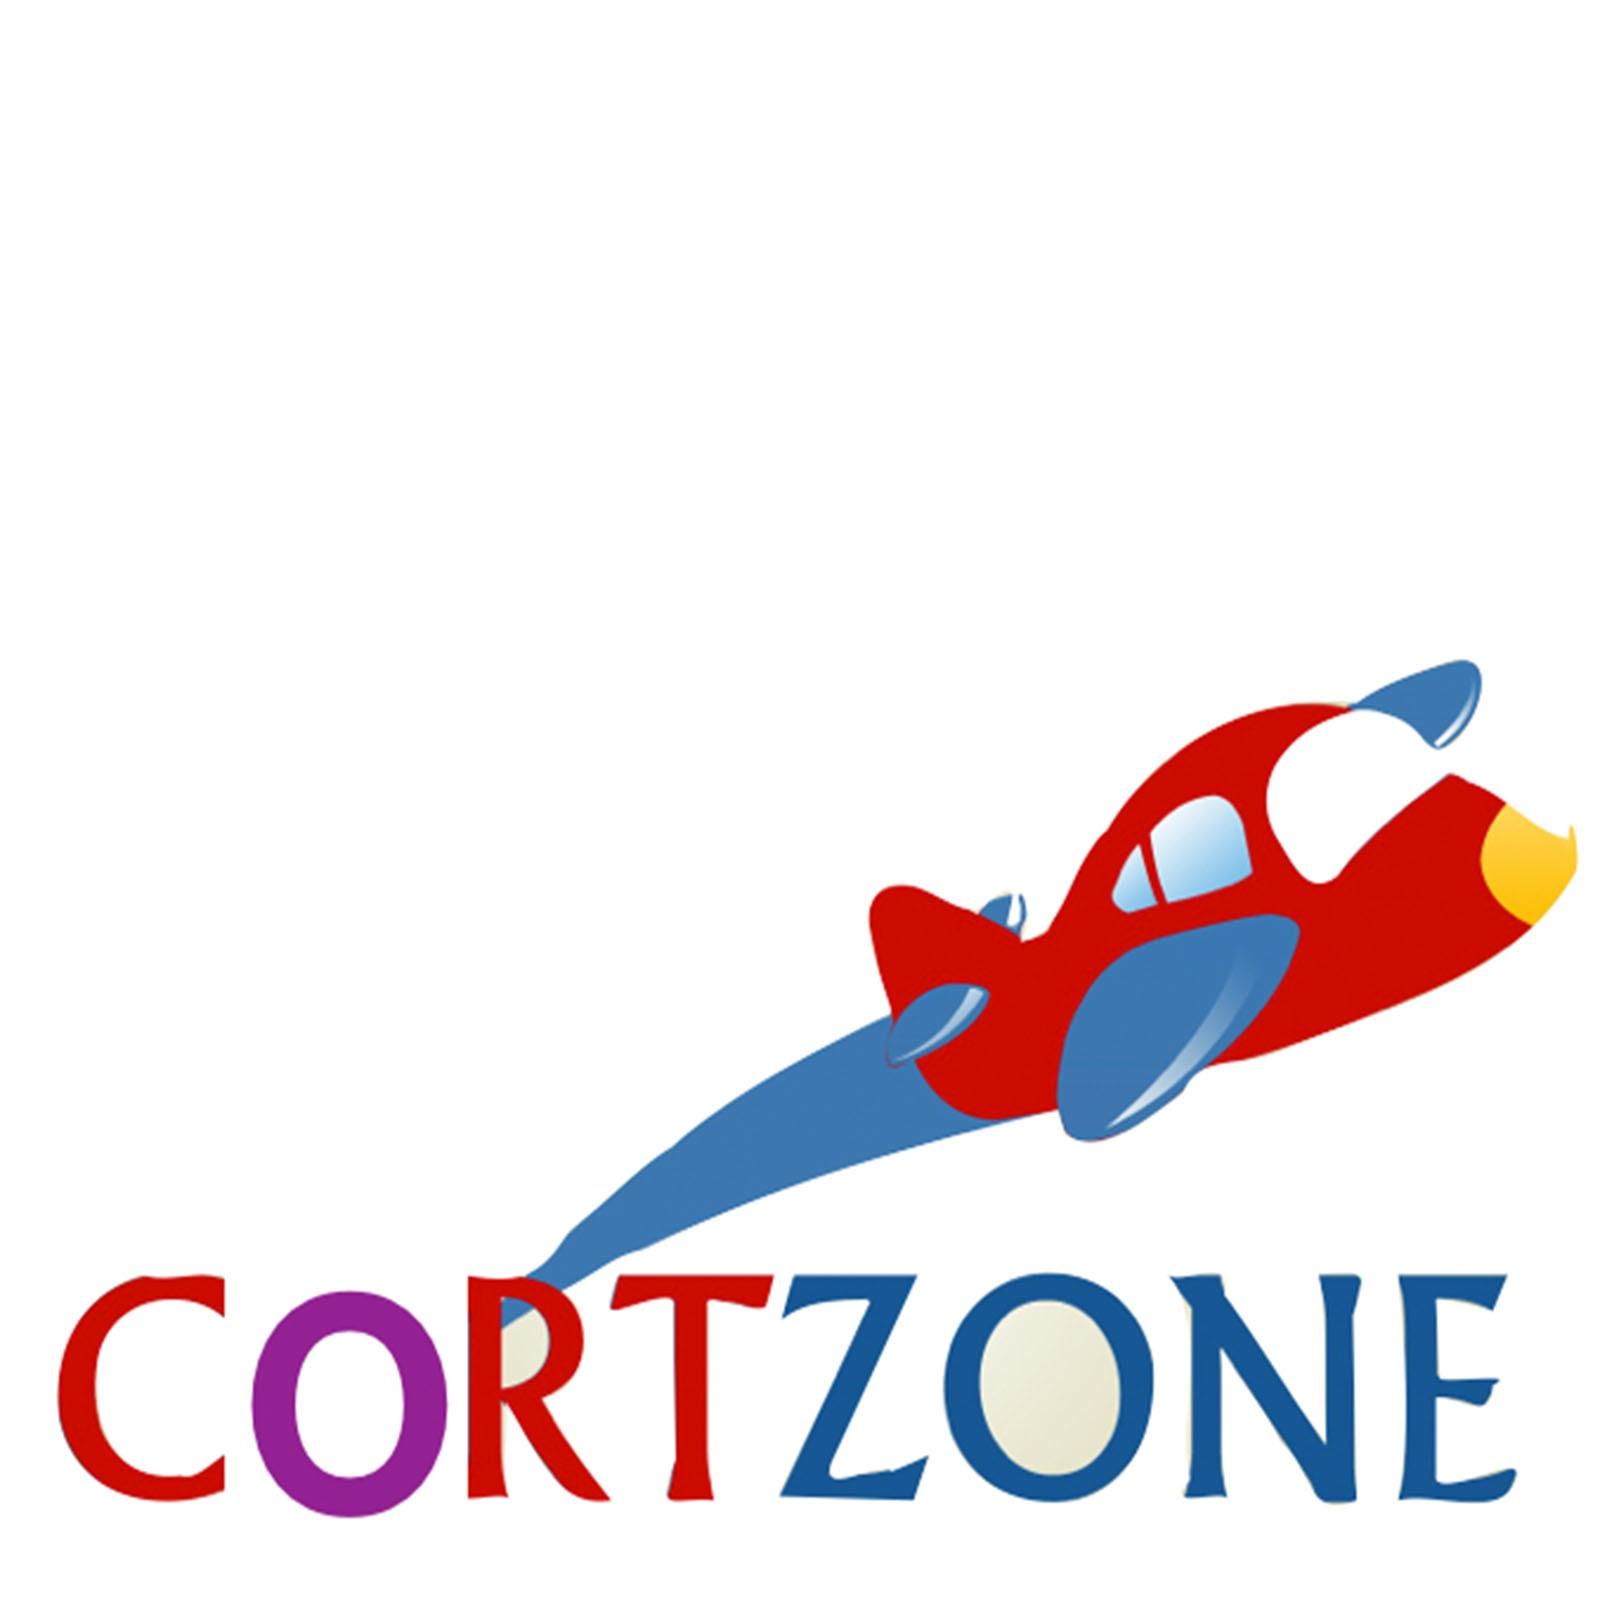 CortZone